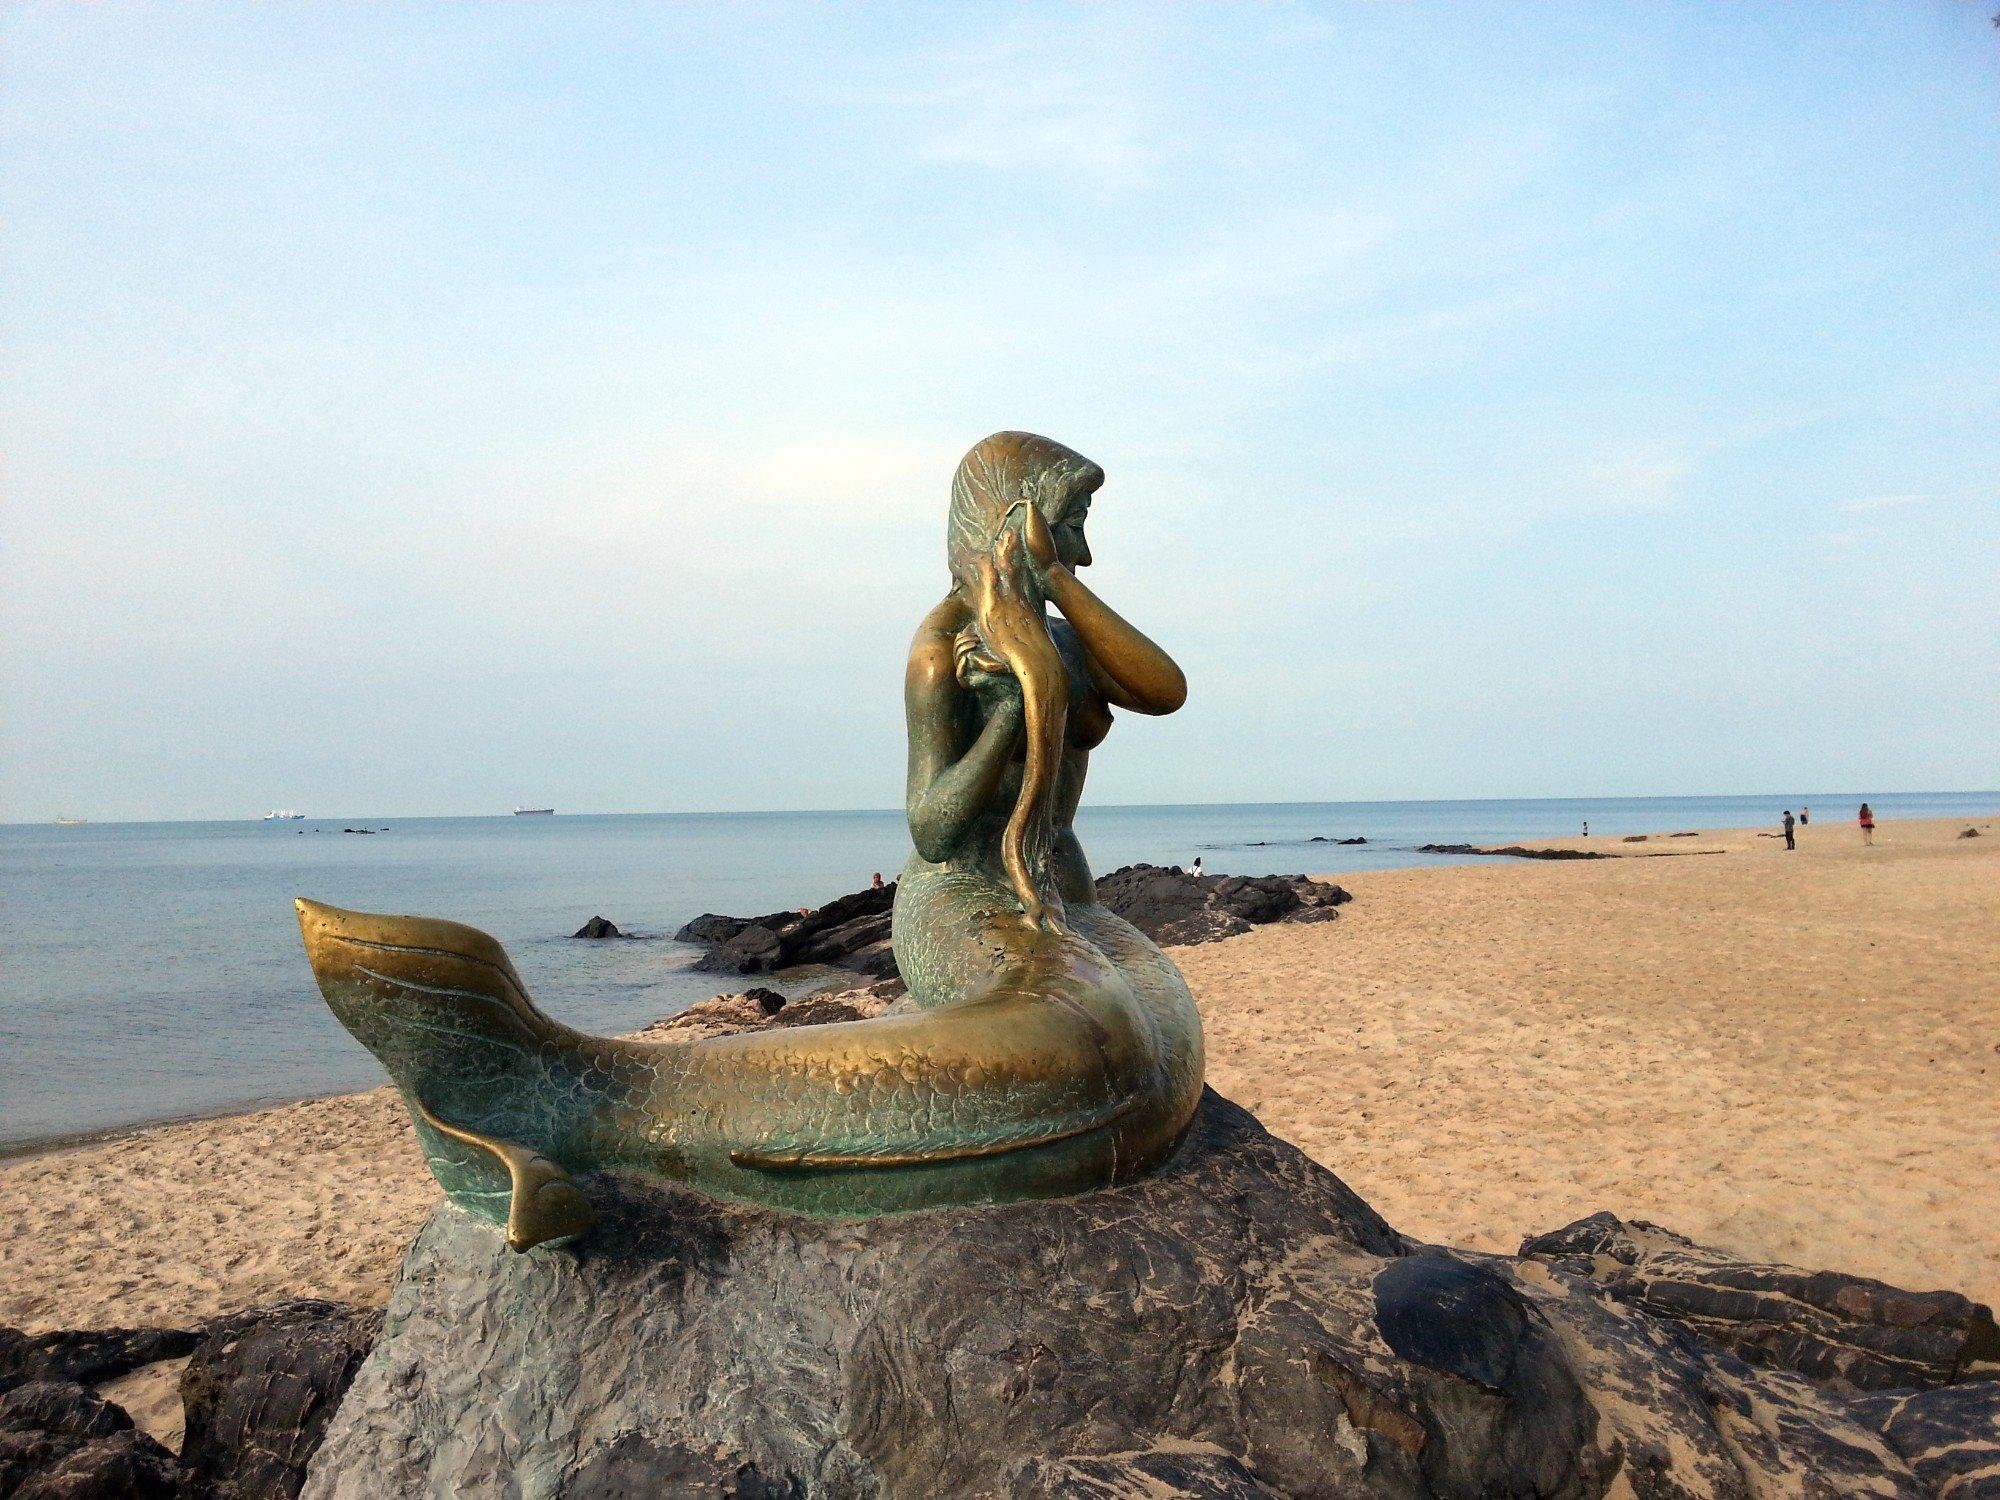 Mermaid statue on Samila Beach